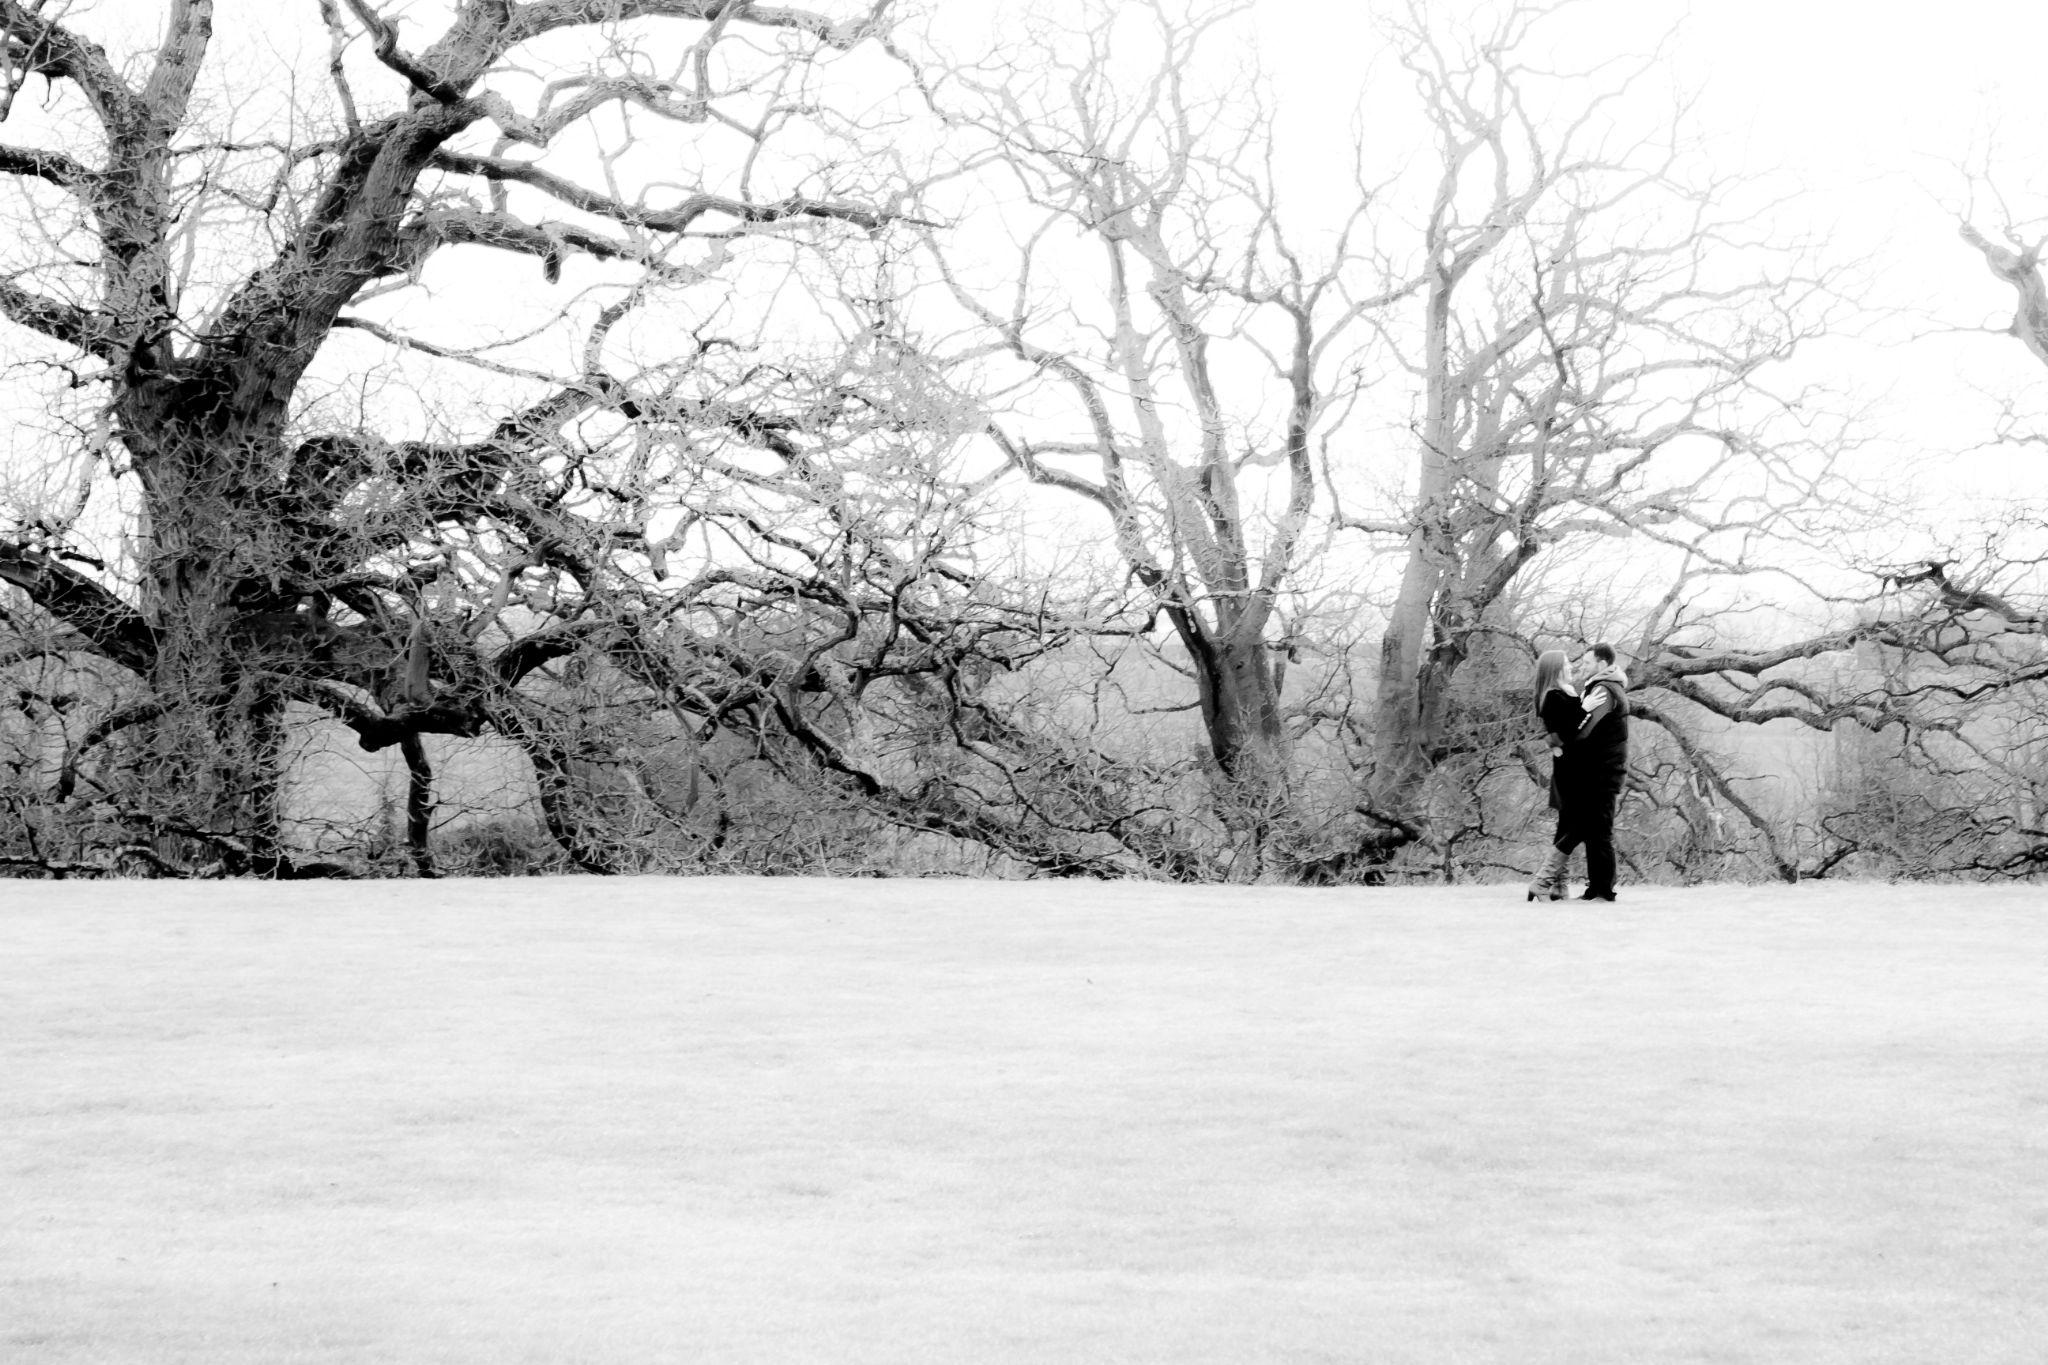 Winter morning by Emma Eirene Photography